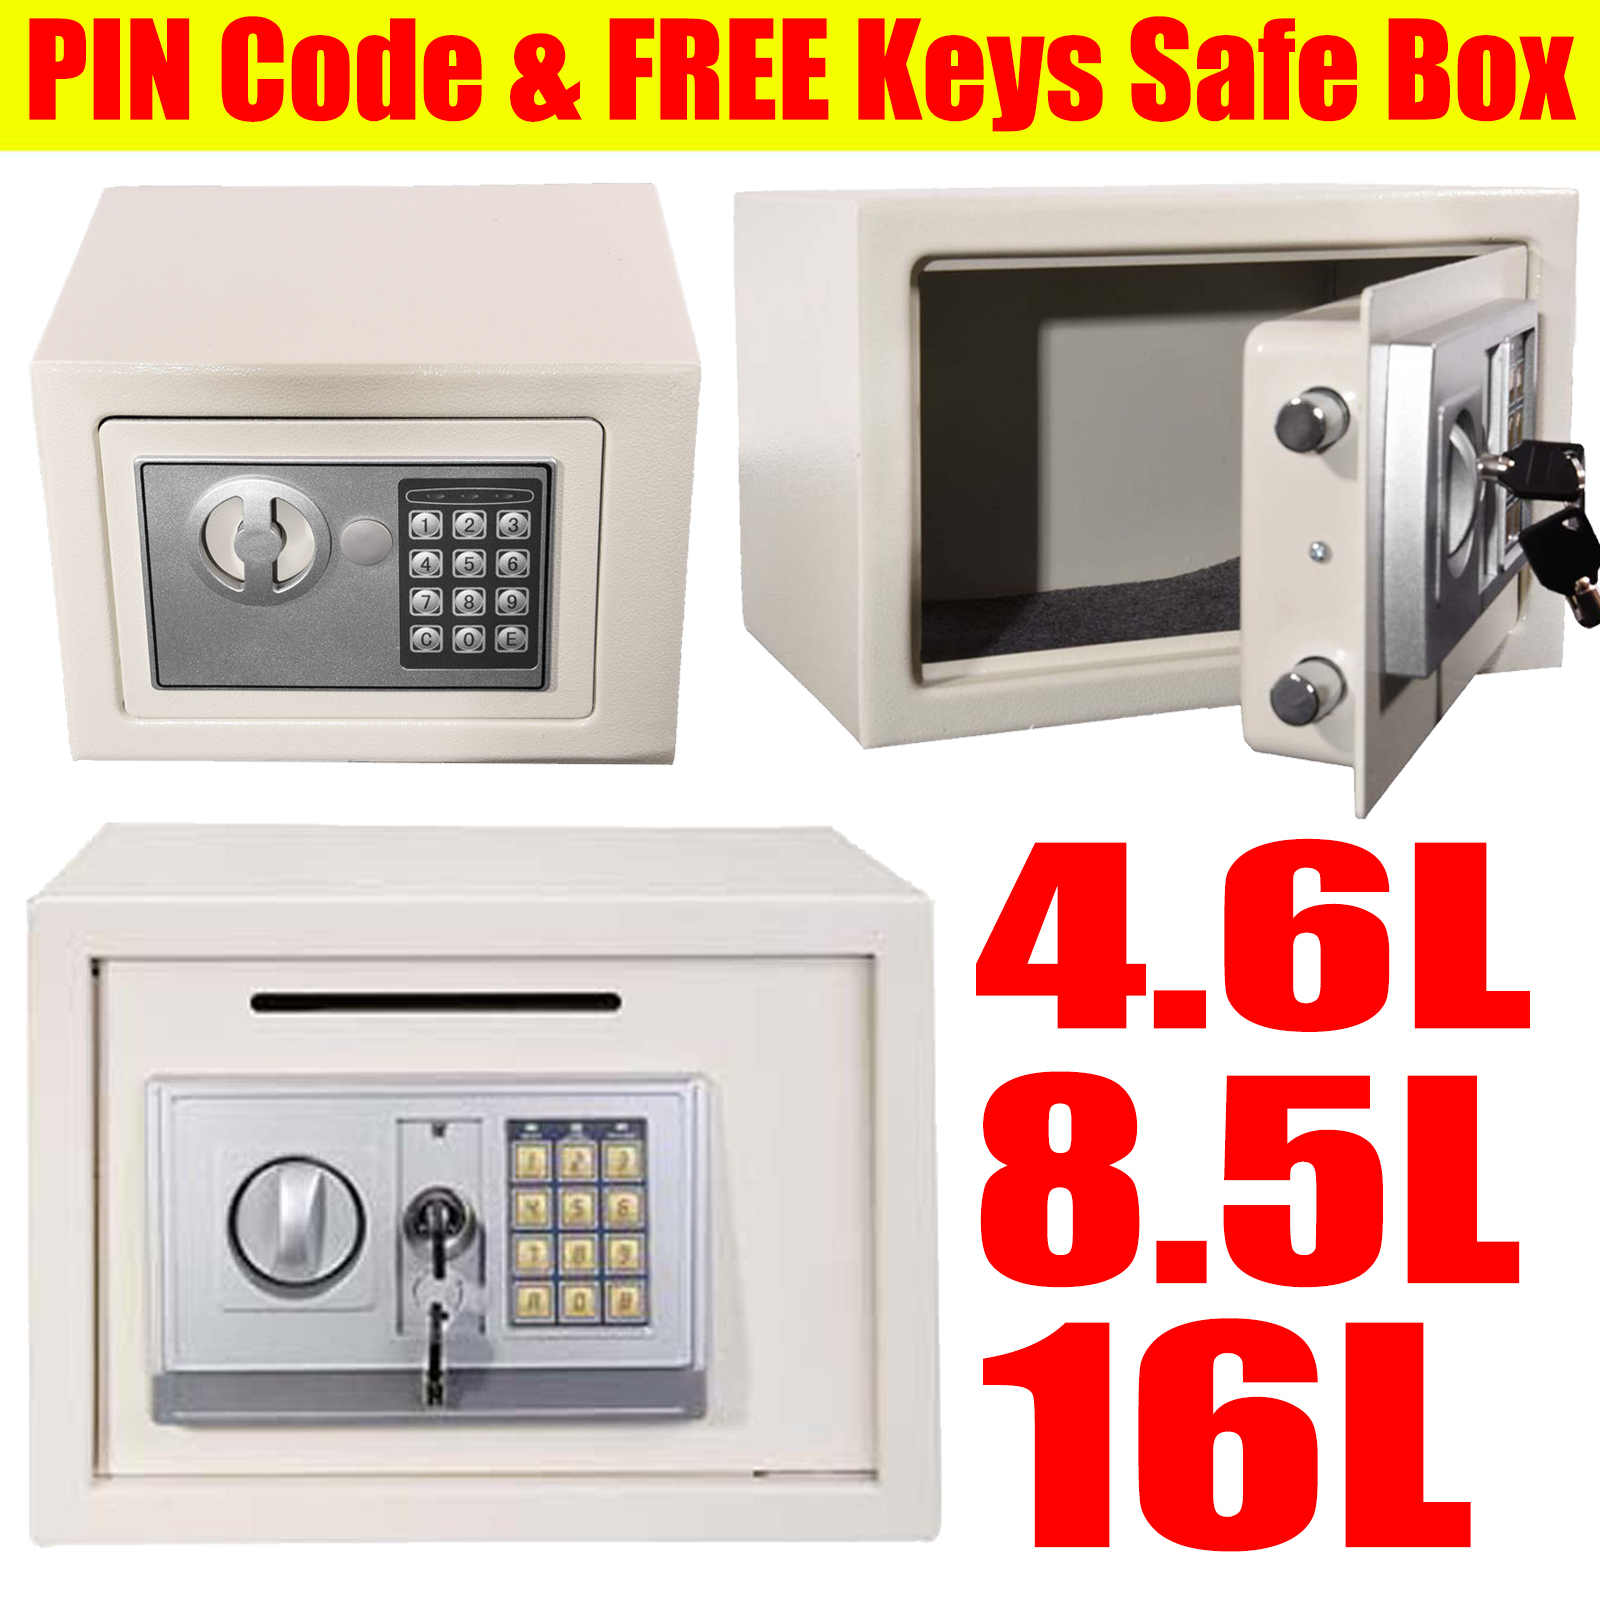 16L 8.5L 4.6 Electronic Password Security Safe Money Cash Deposit Box Safety Hot